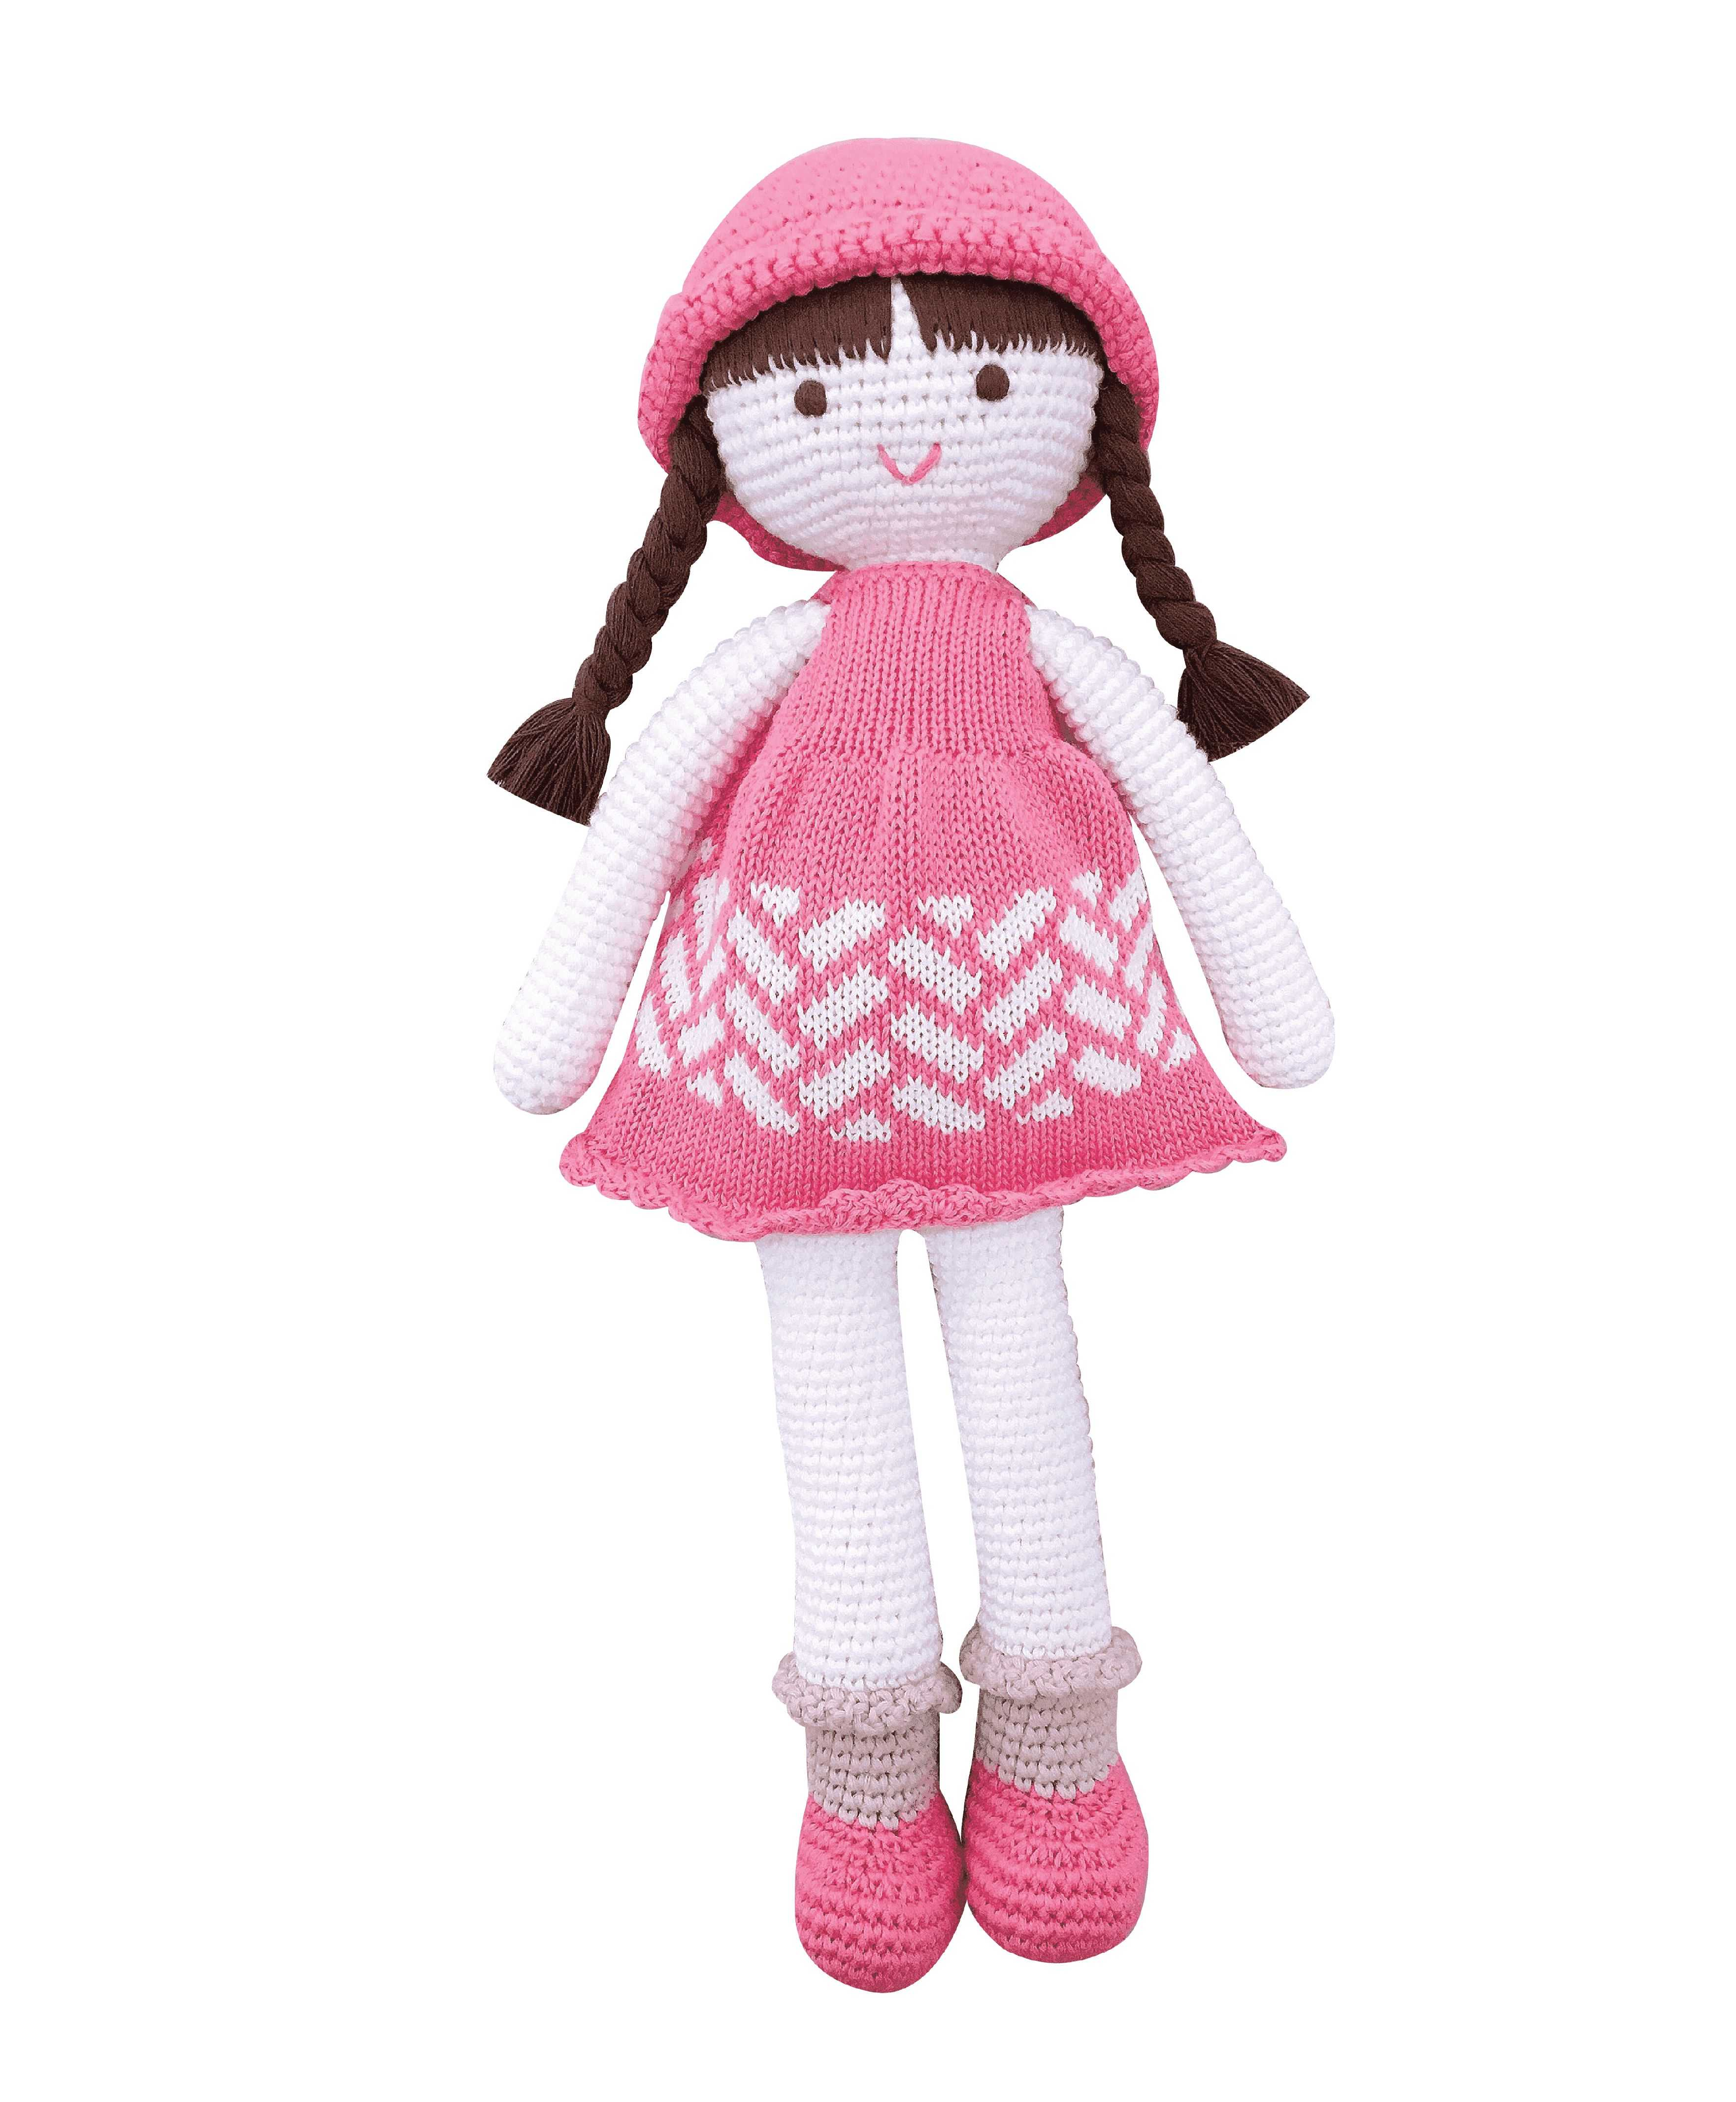 Vida Doll